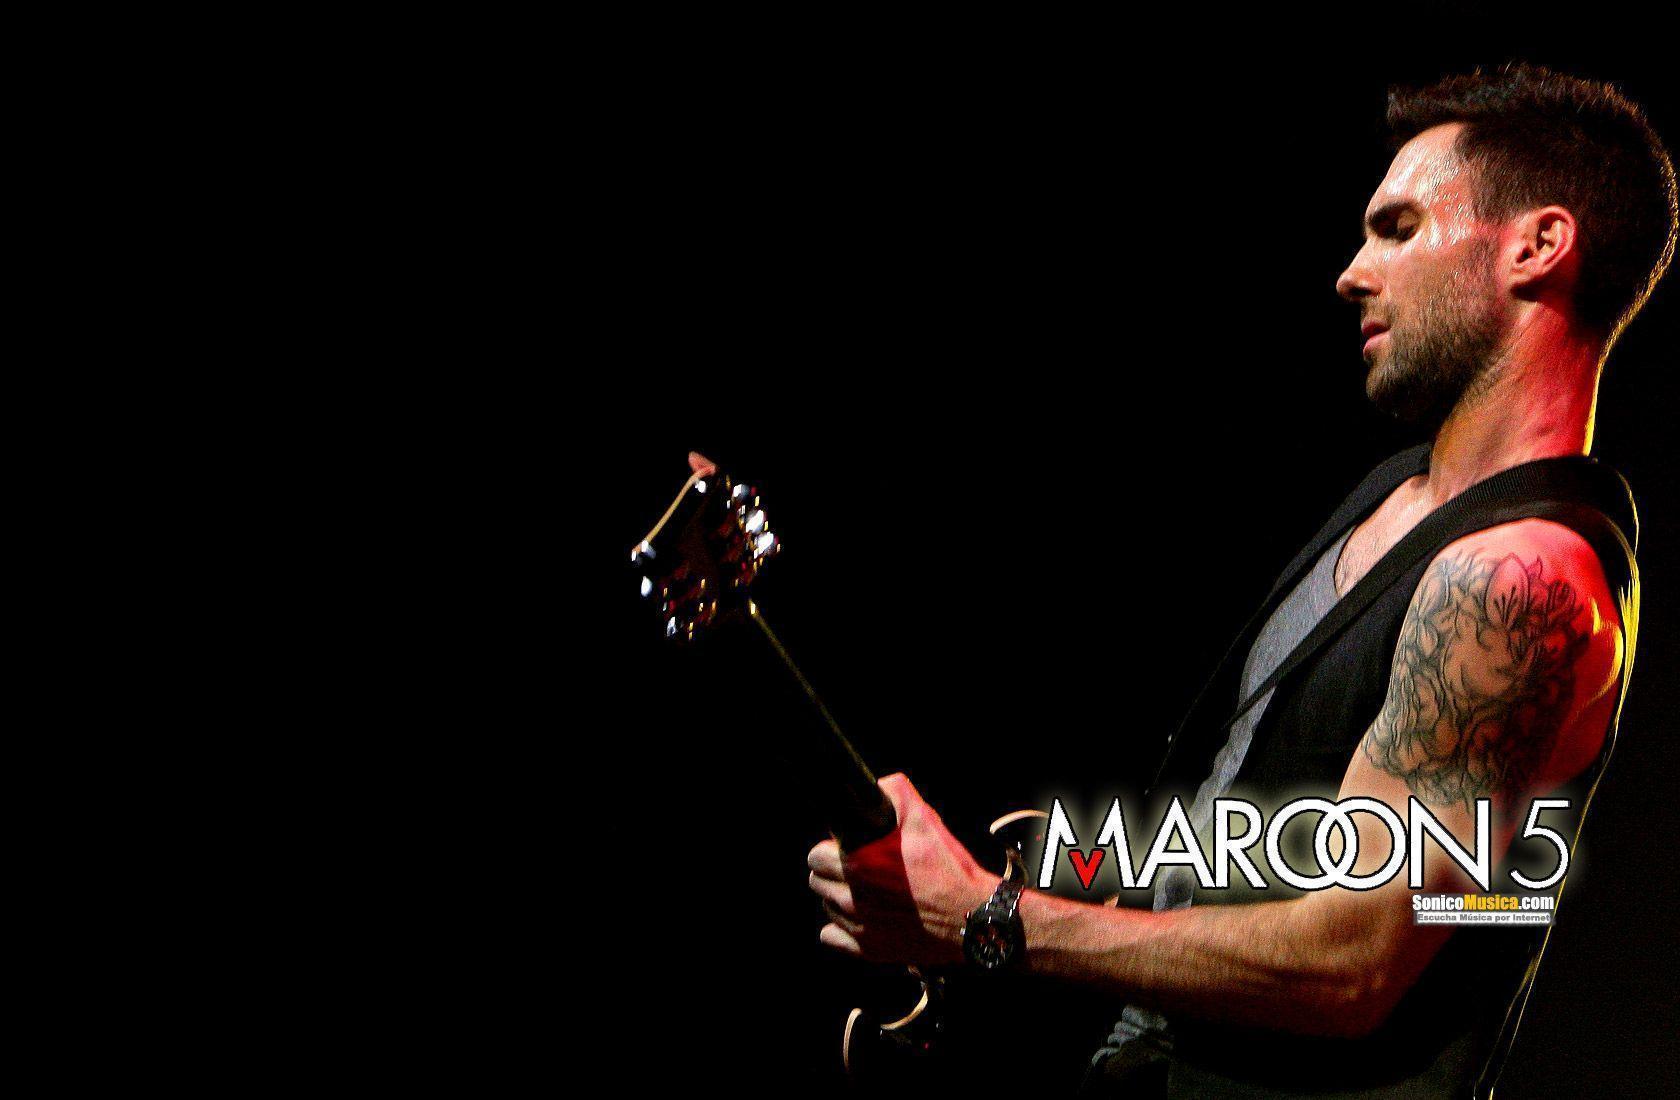 Maroon 5 Wallpapers